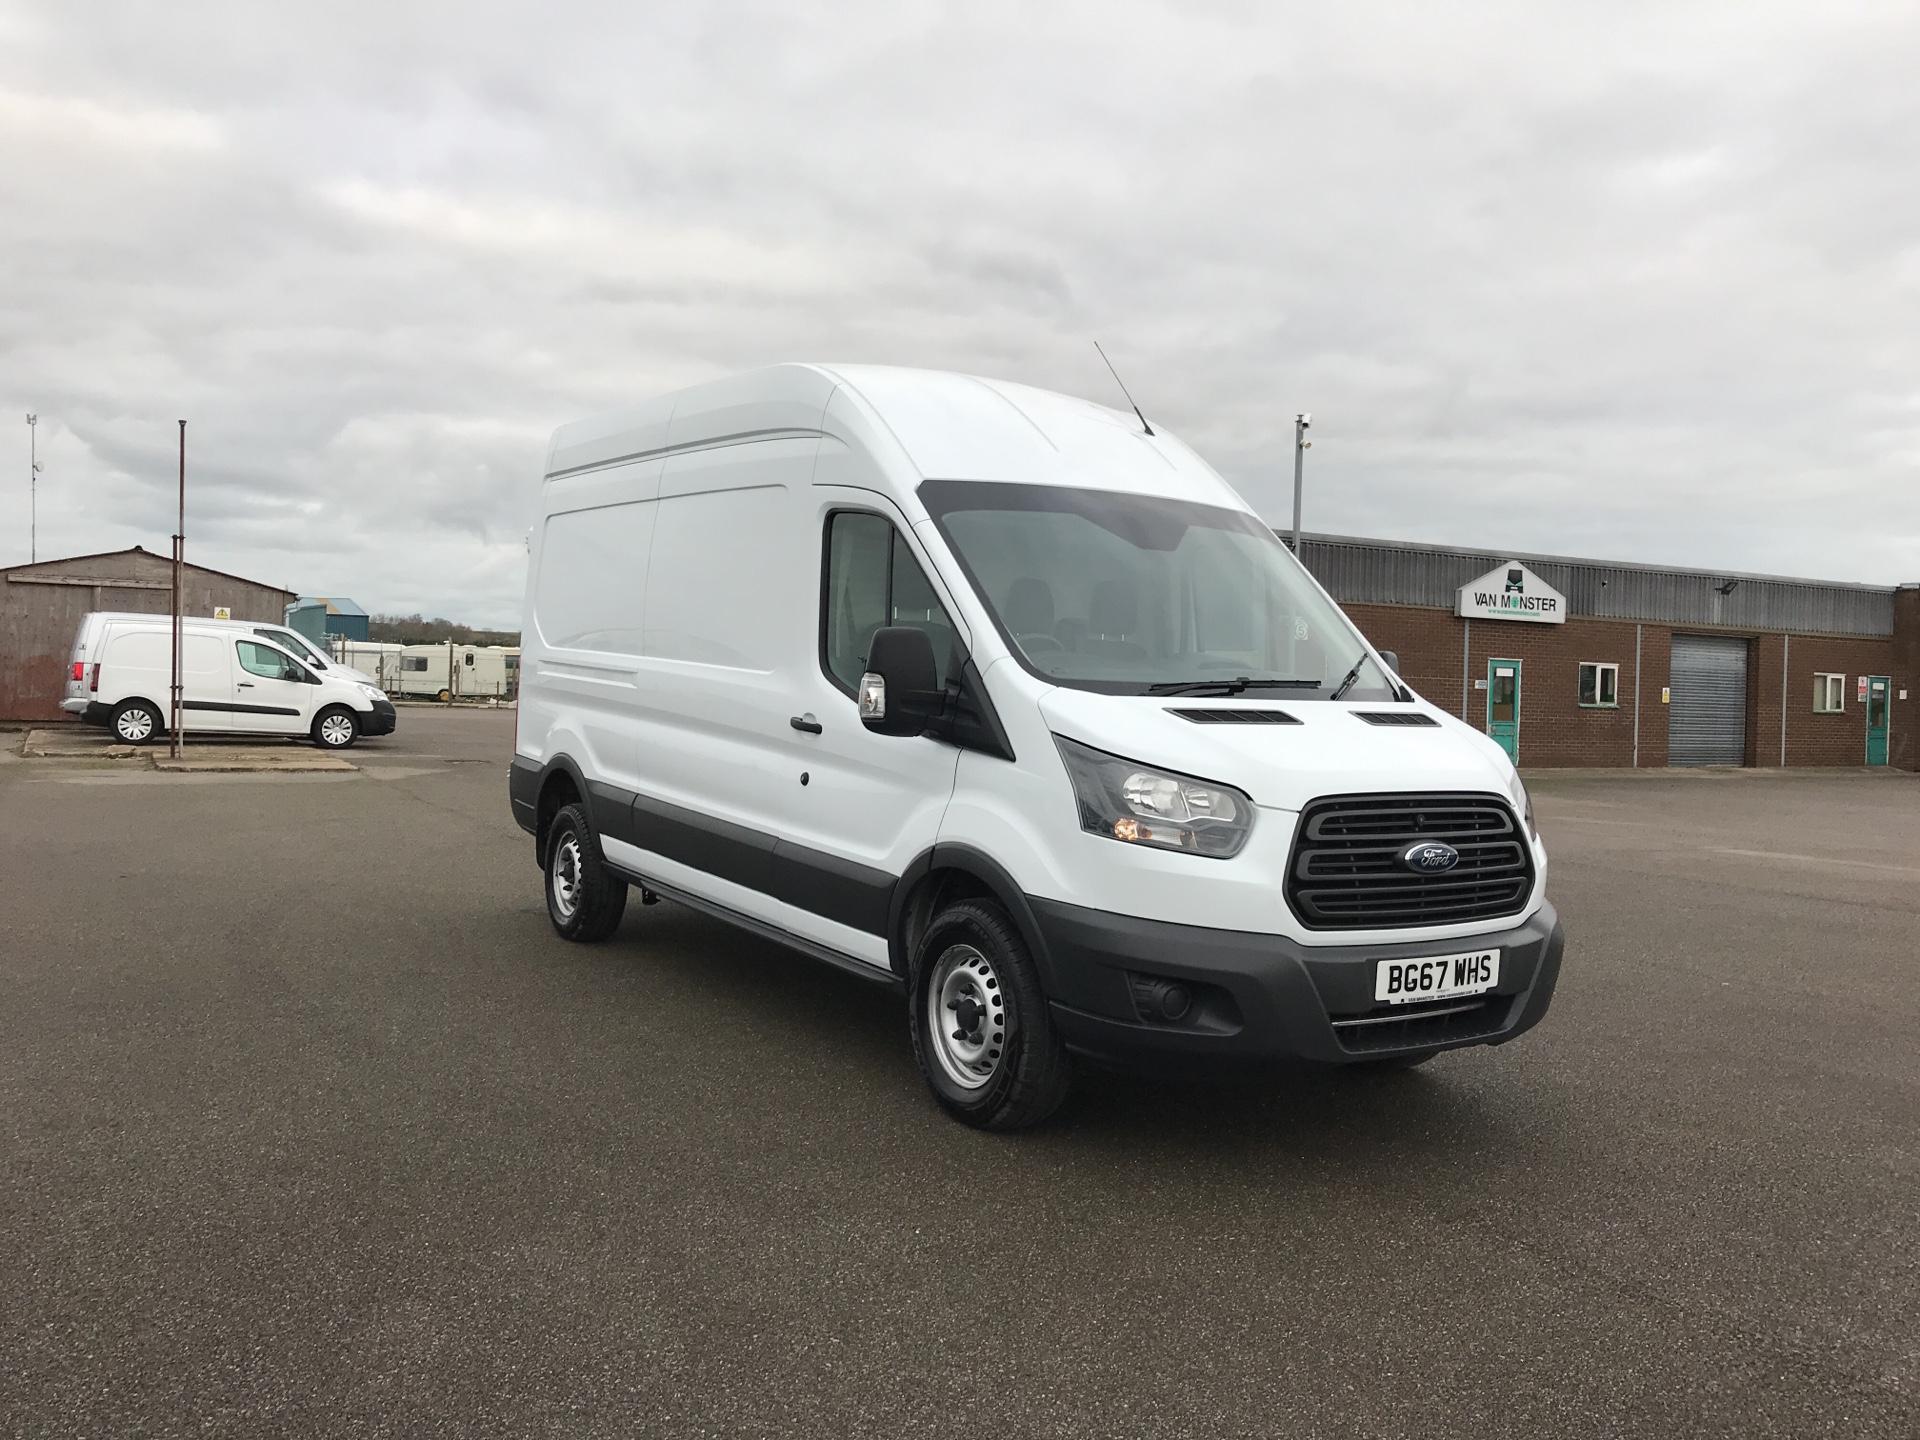 2017 Ford Transit L3 H3 VAN 130PS EURO 6 (BG67WHS)